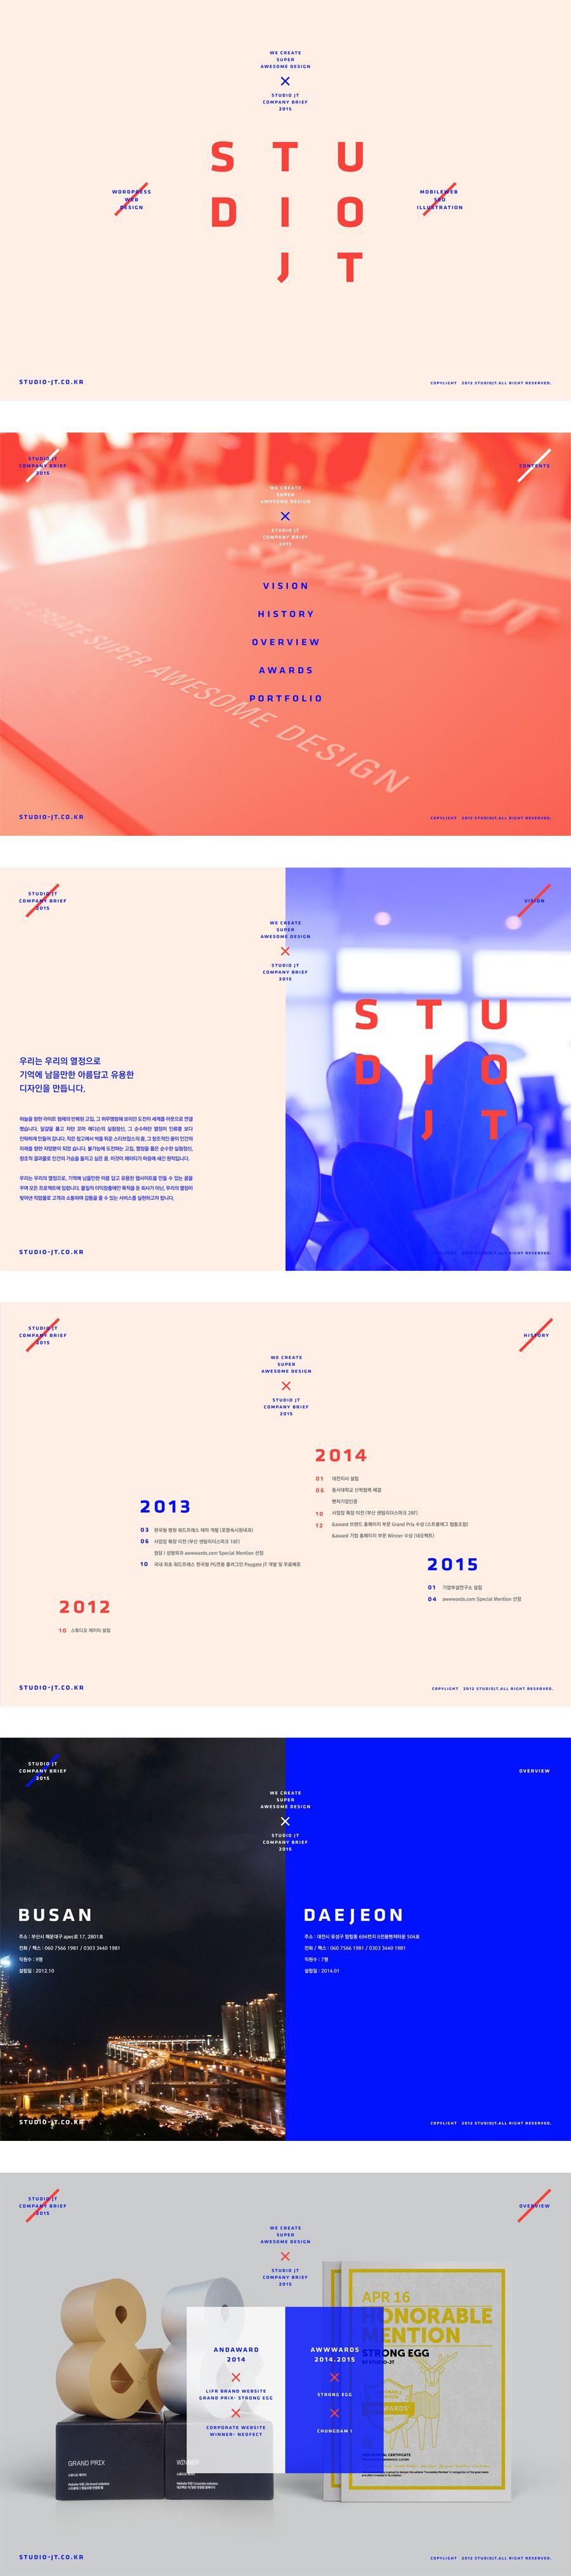 studio jt design by padak